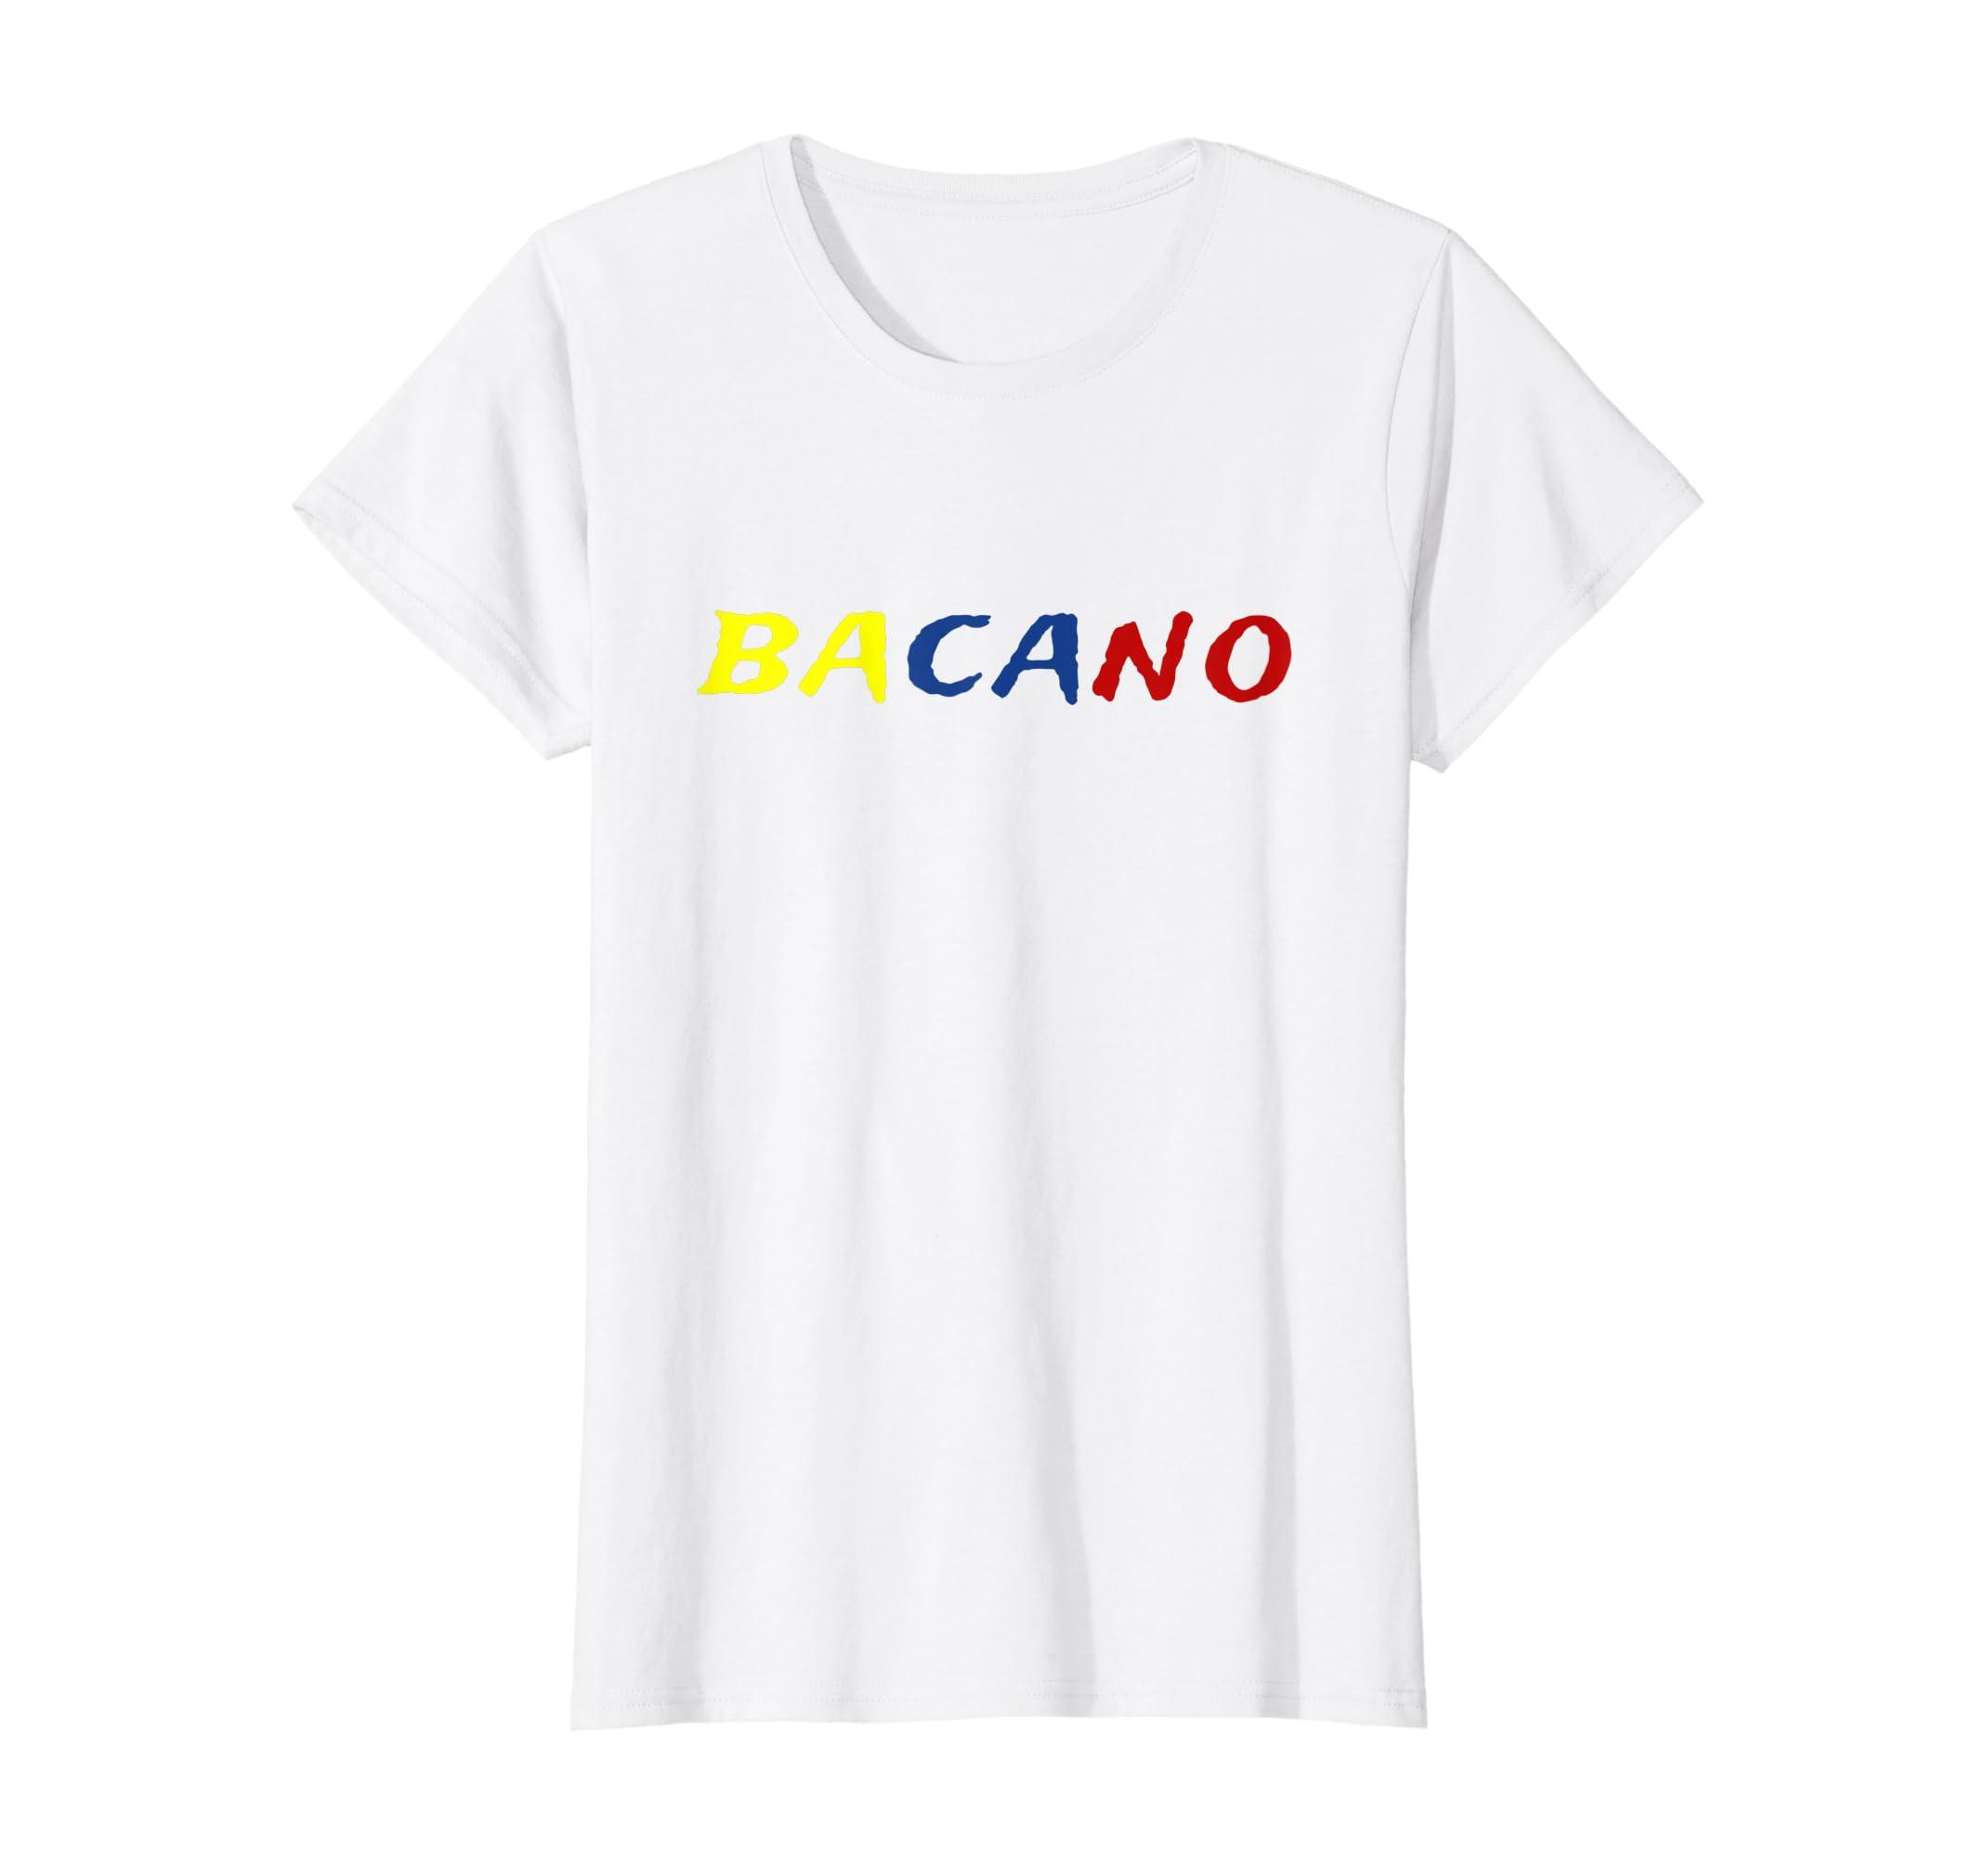 46616ebb8 Amazon.com  Bacano Funny Colombian T-Shirt Colombian Slang  Clothing